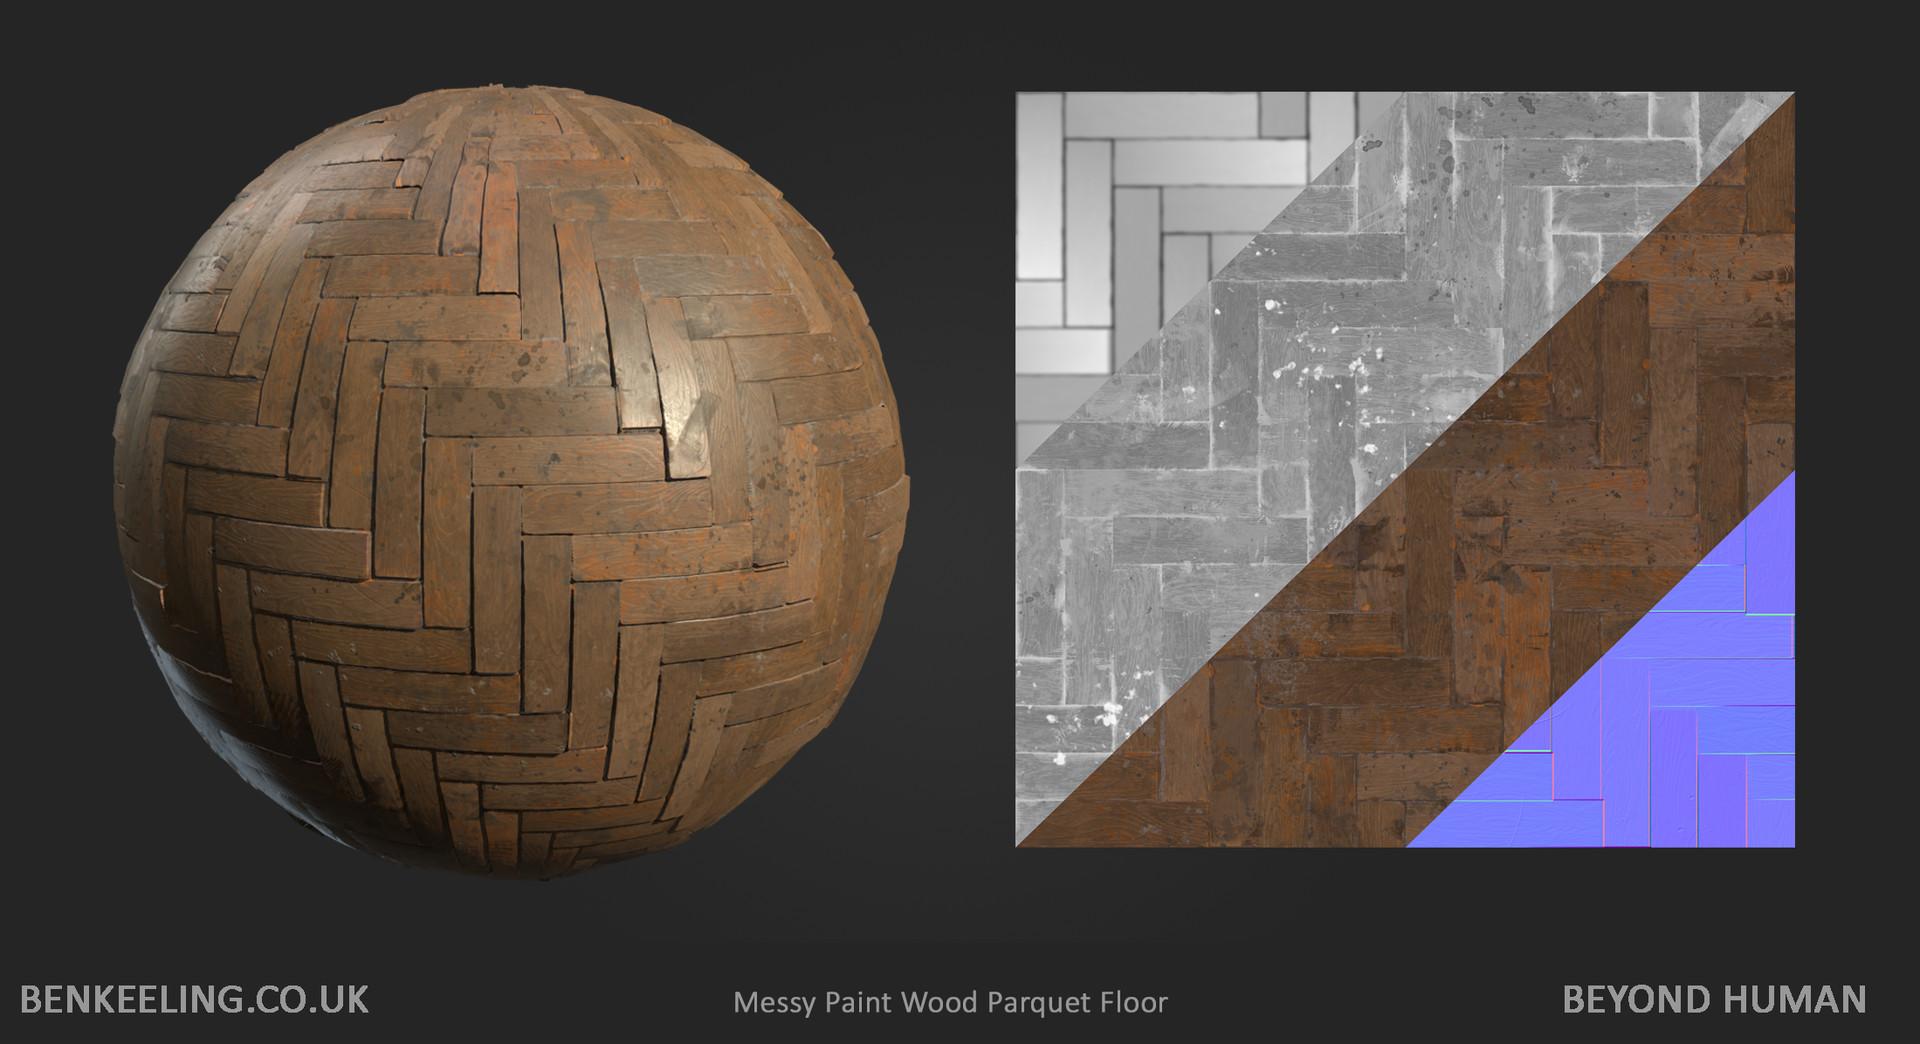 Materials - Messy Parquet Floor